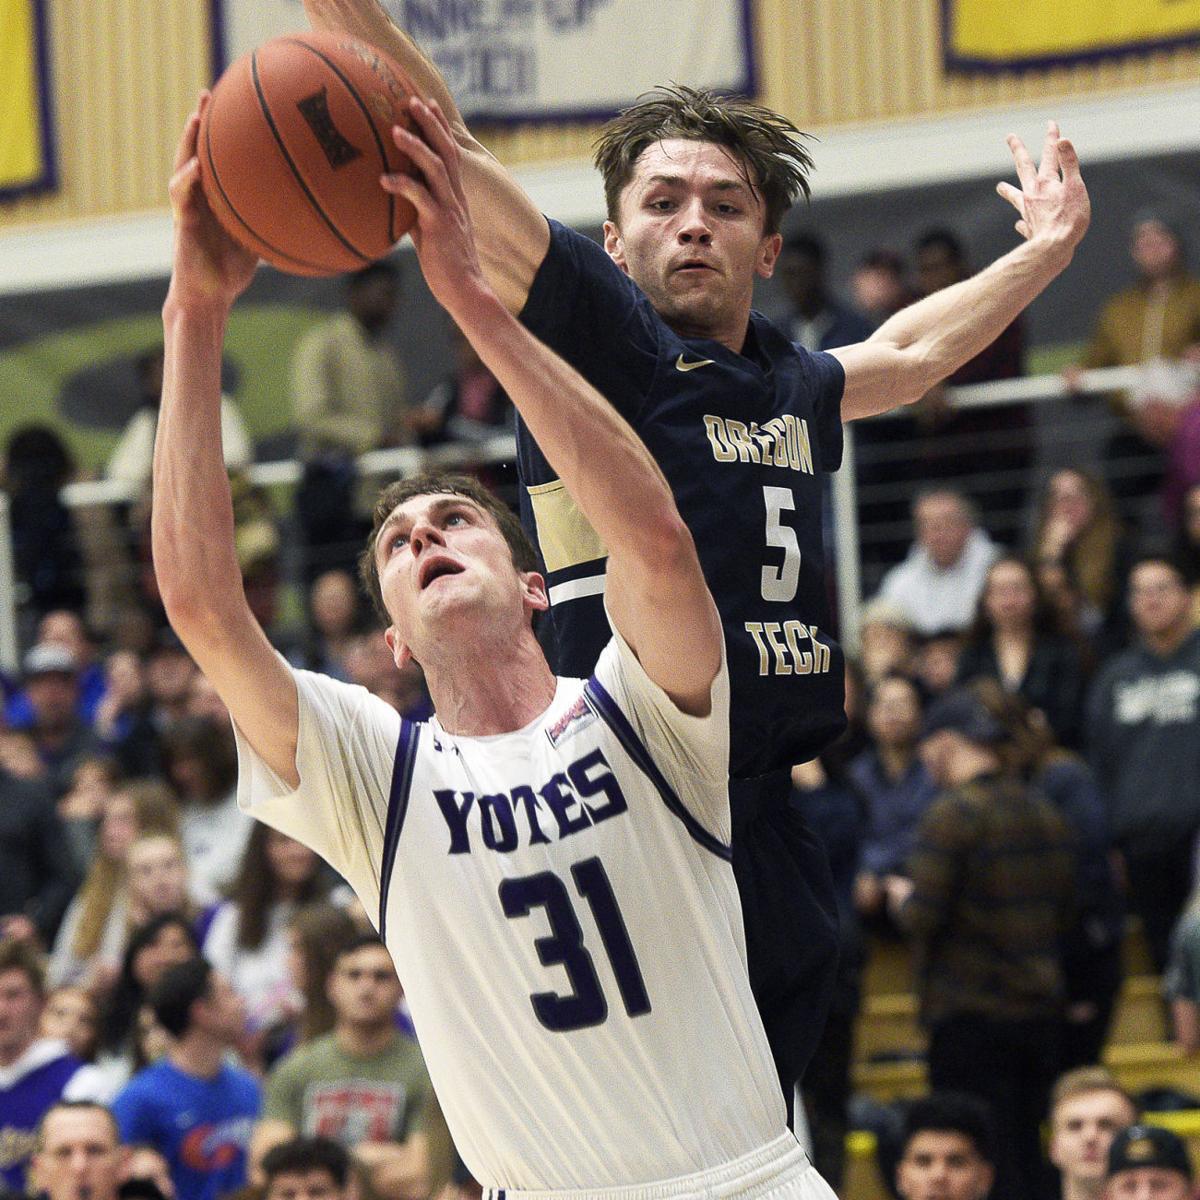 No. 3 Yotes complete season sweep of No. 5 Oregon Tech